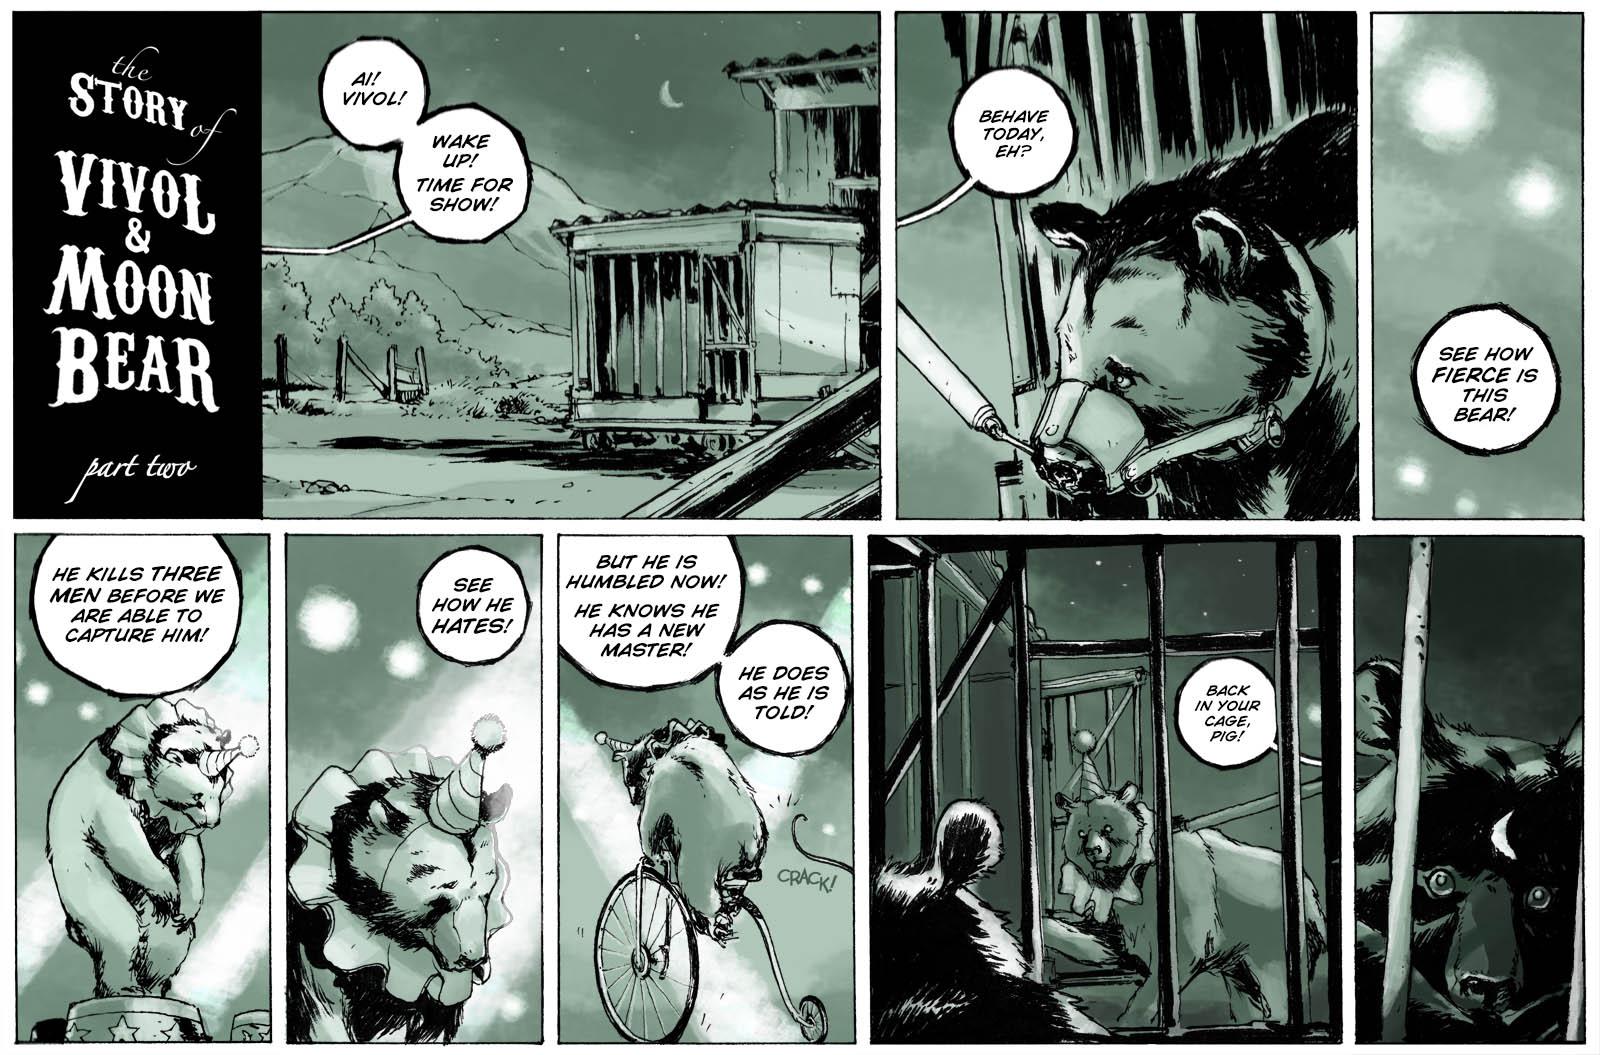 The Story of Vivol & Moon Bear – part two